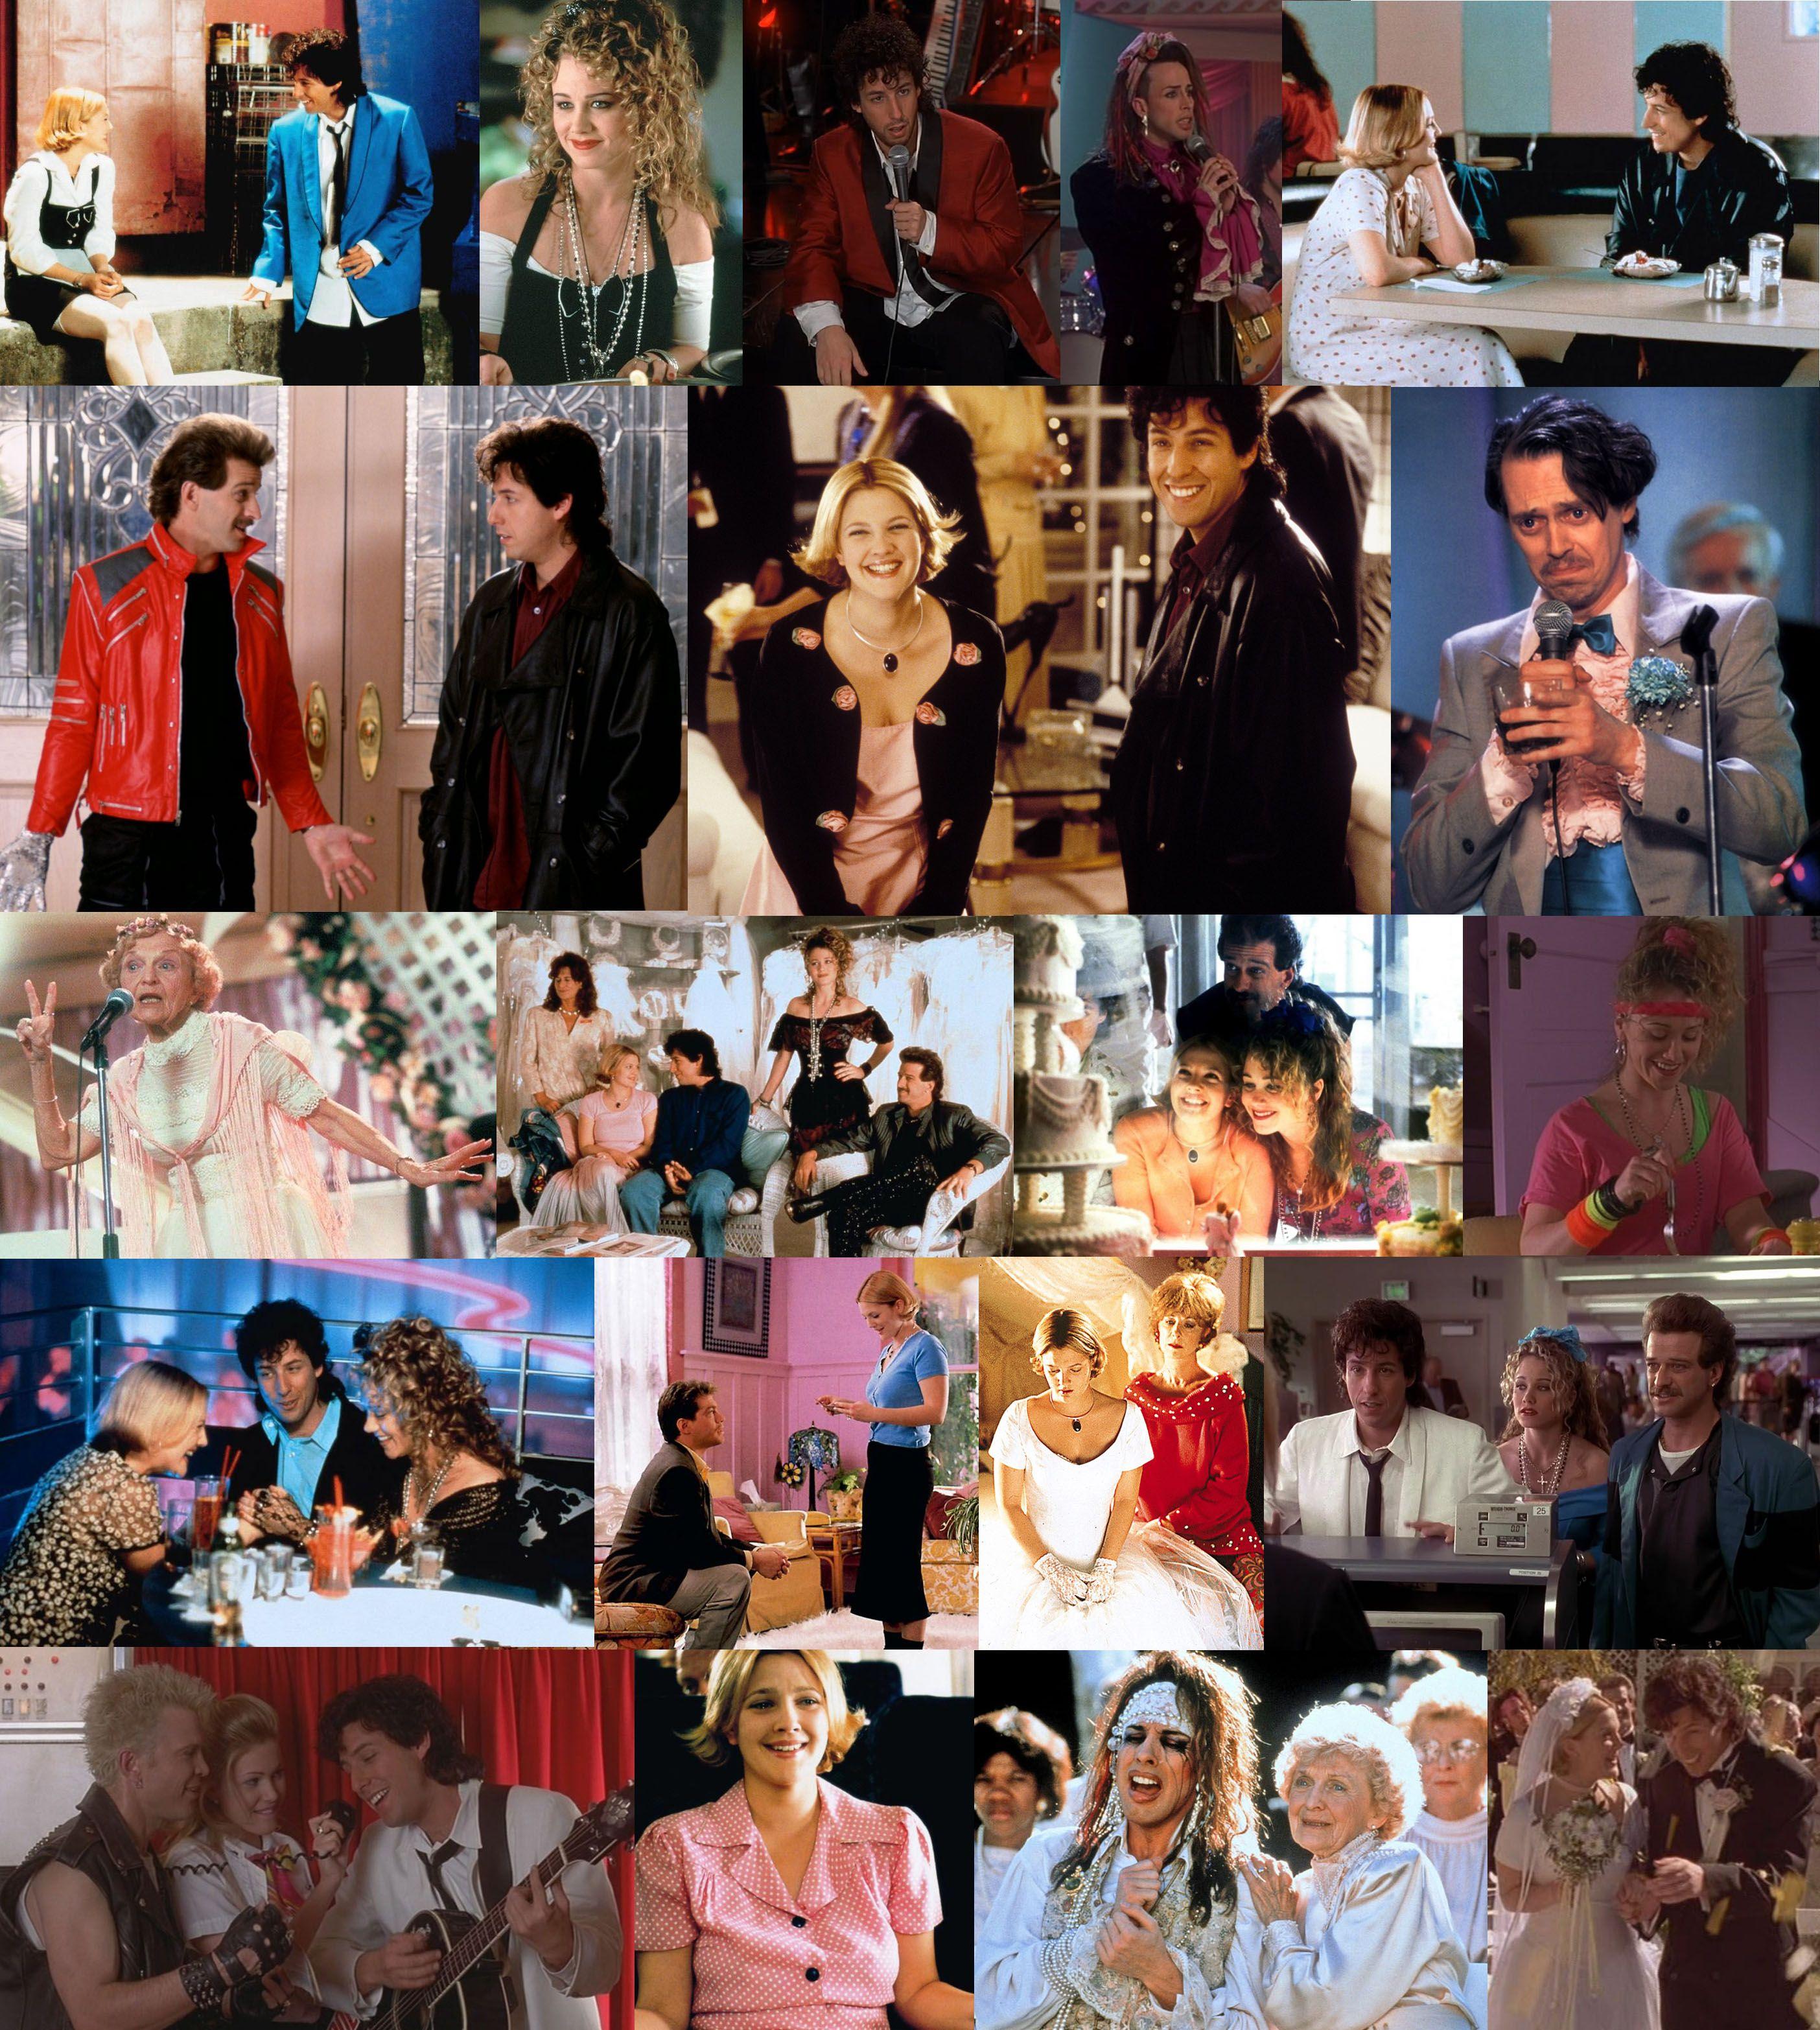 One Of My Absolute Favorites Love Adam Sandler And Drew Berrymore The Wedding Singer